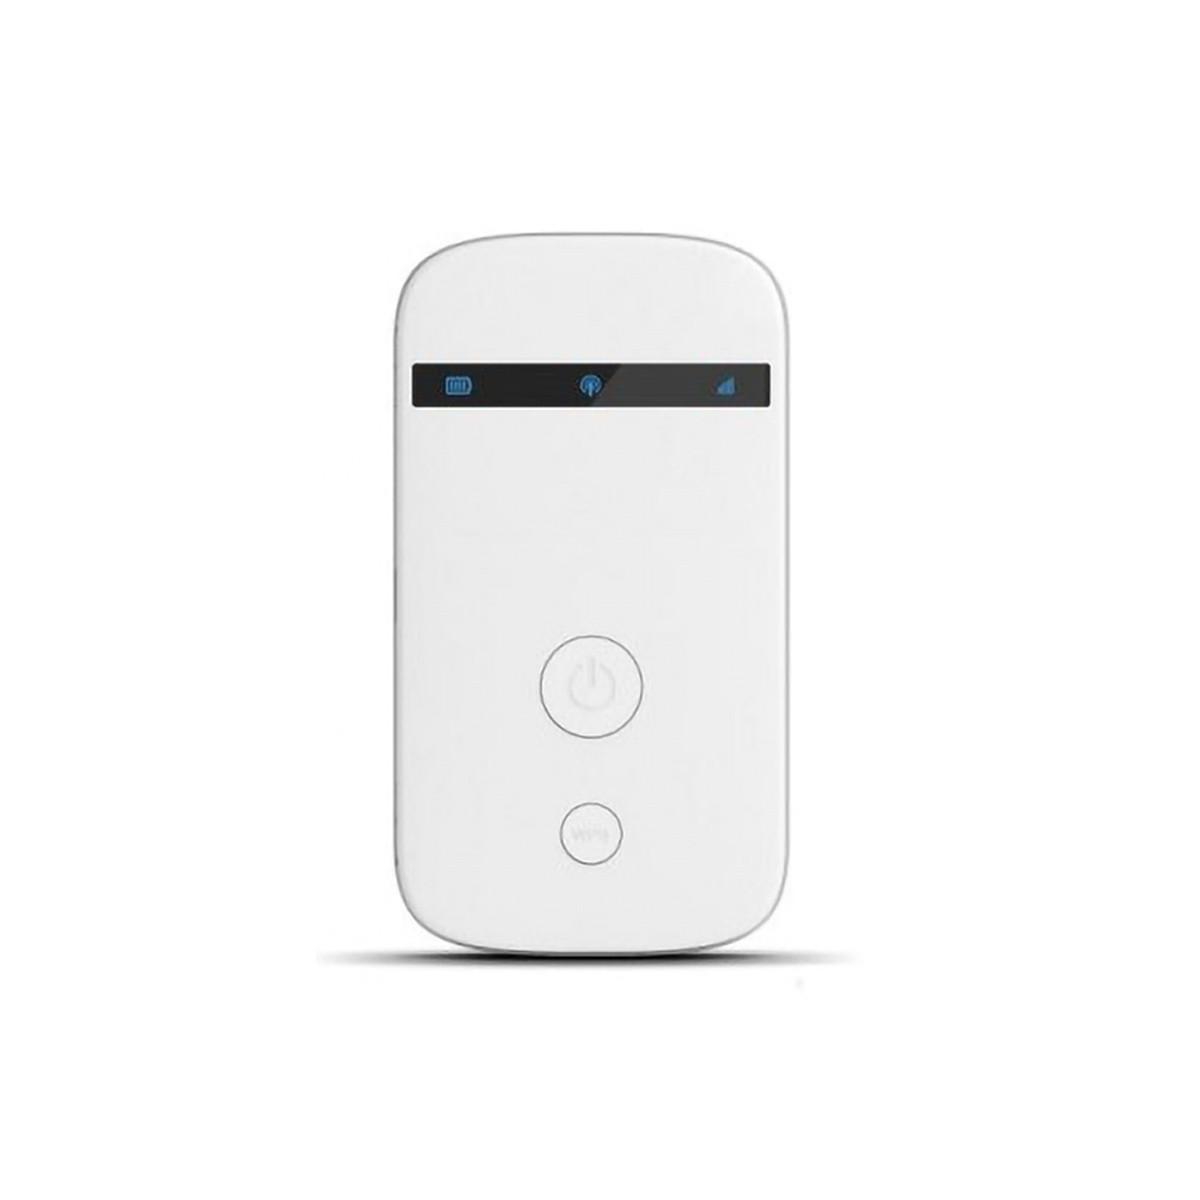 4G LTE Wi-Fi роутер ZTE MF90-C1 (Киевстар, Vodafone, Lifecell) MIMO х 2 антенных выхода